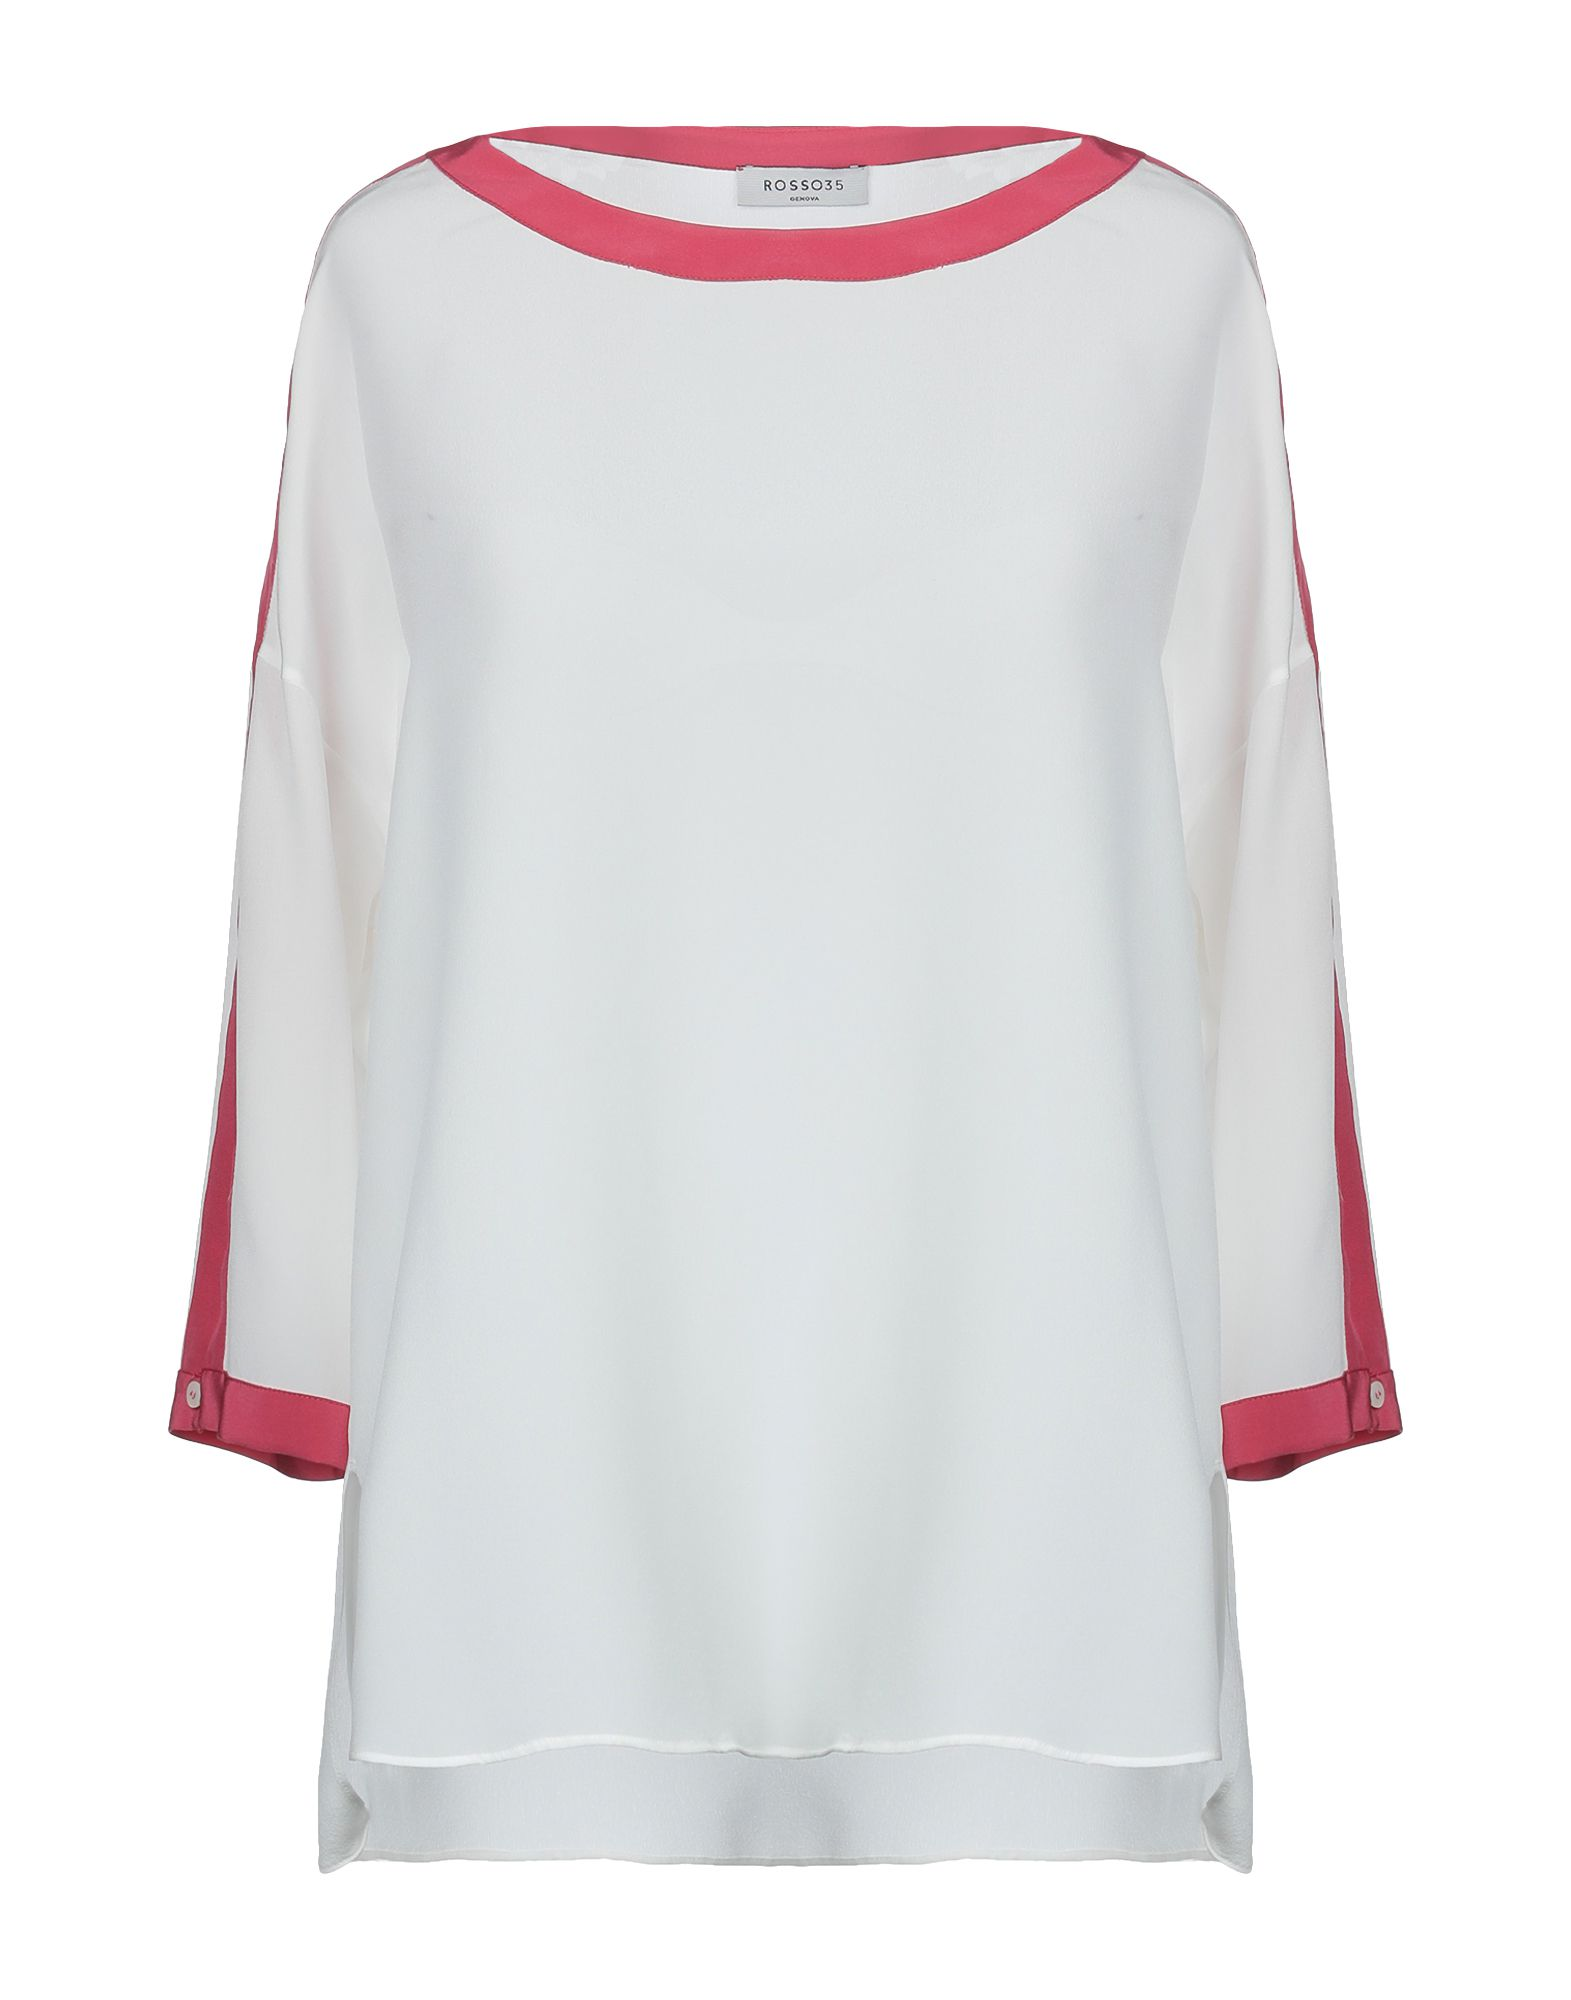 ROSSO35 Блузка rosso35 блузка